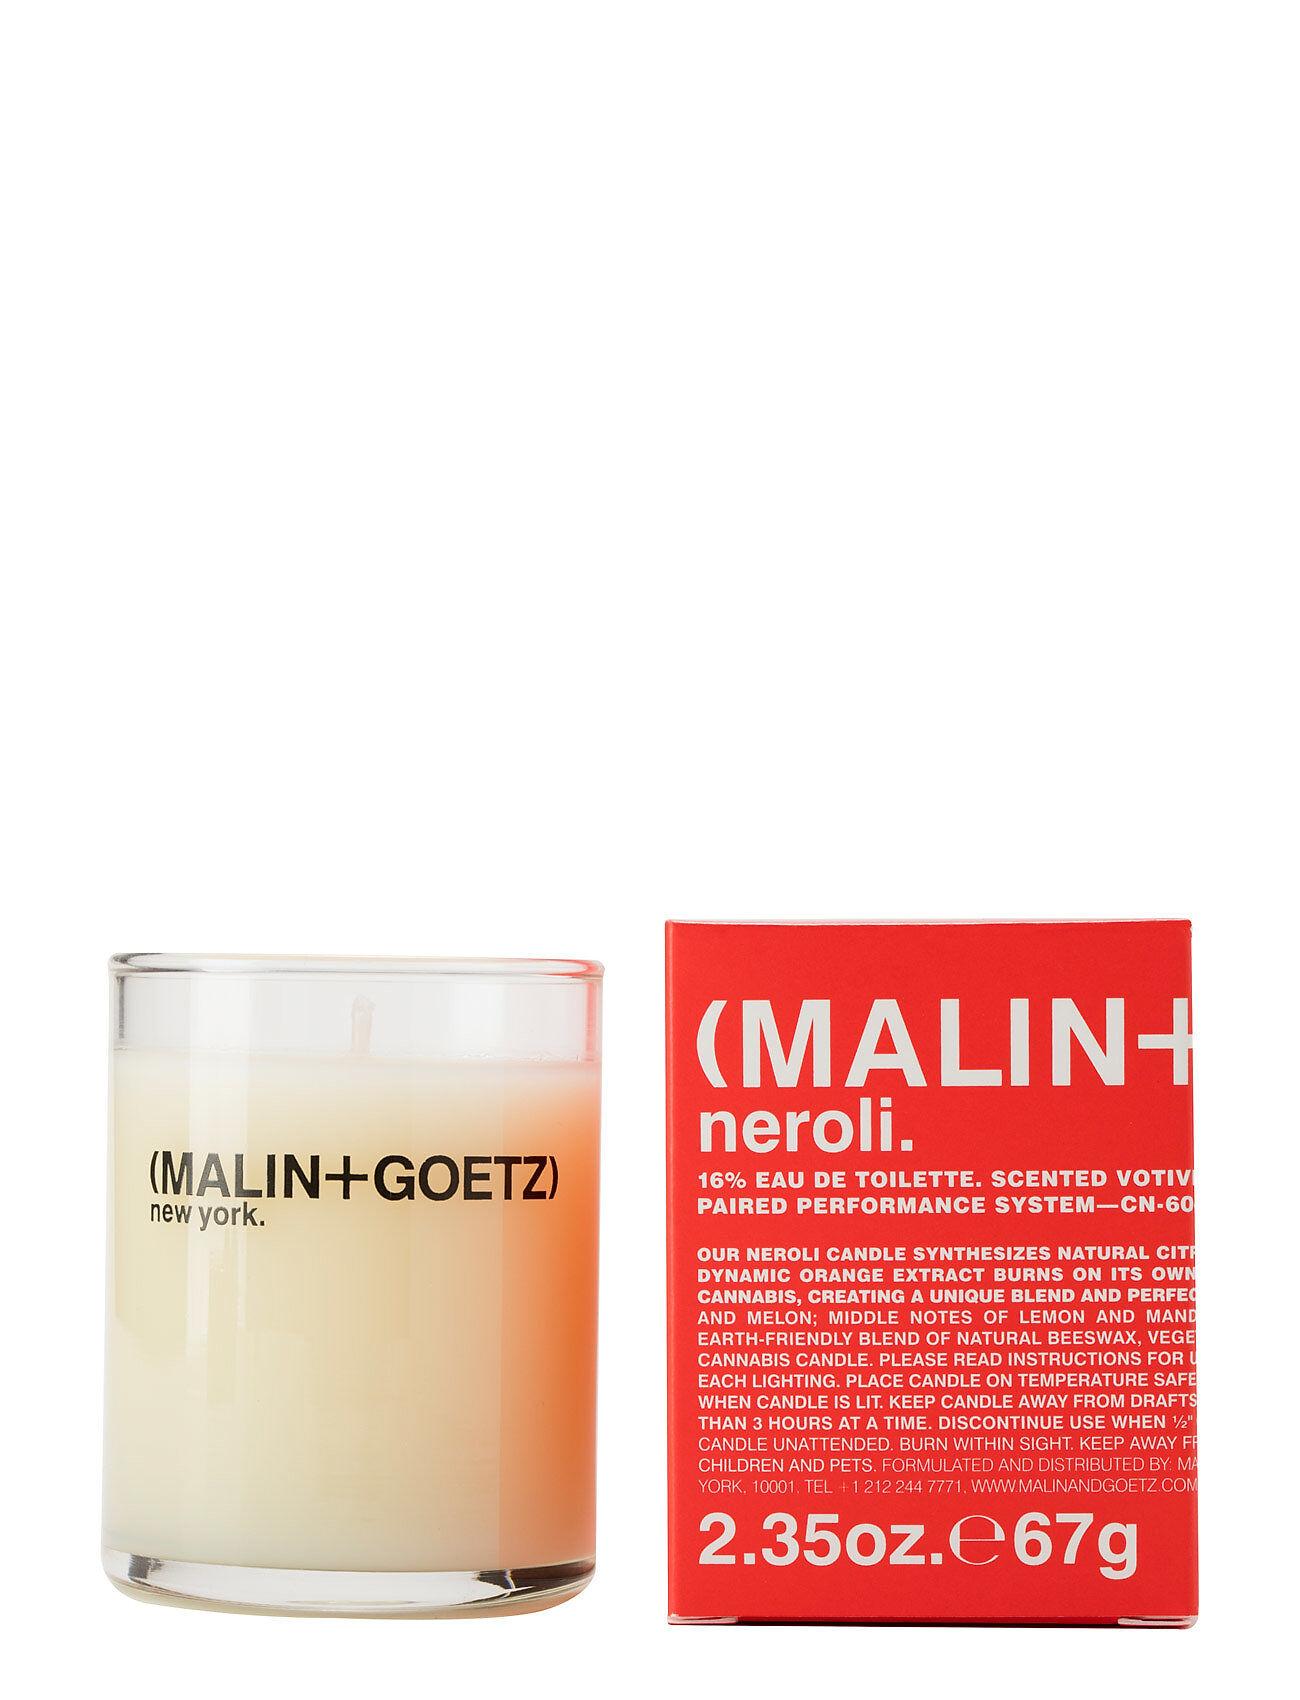 Malin+Goetz Neroli Votive Candle